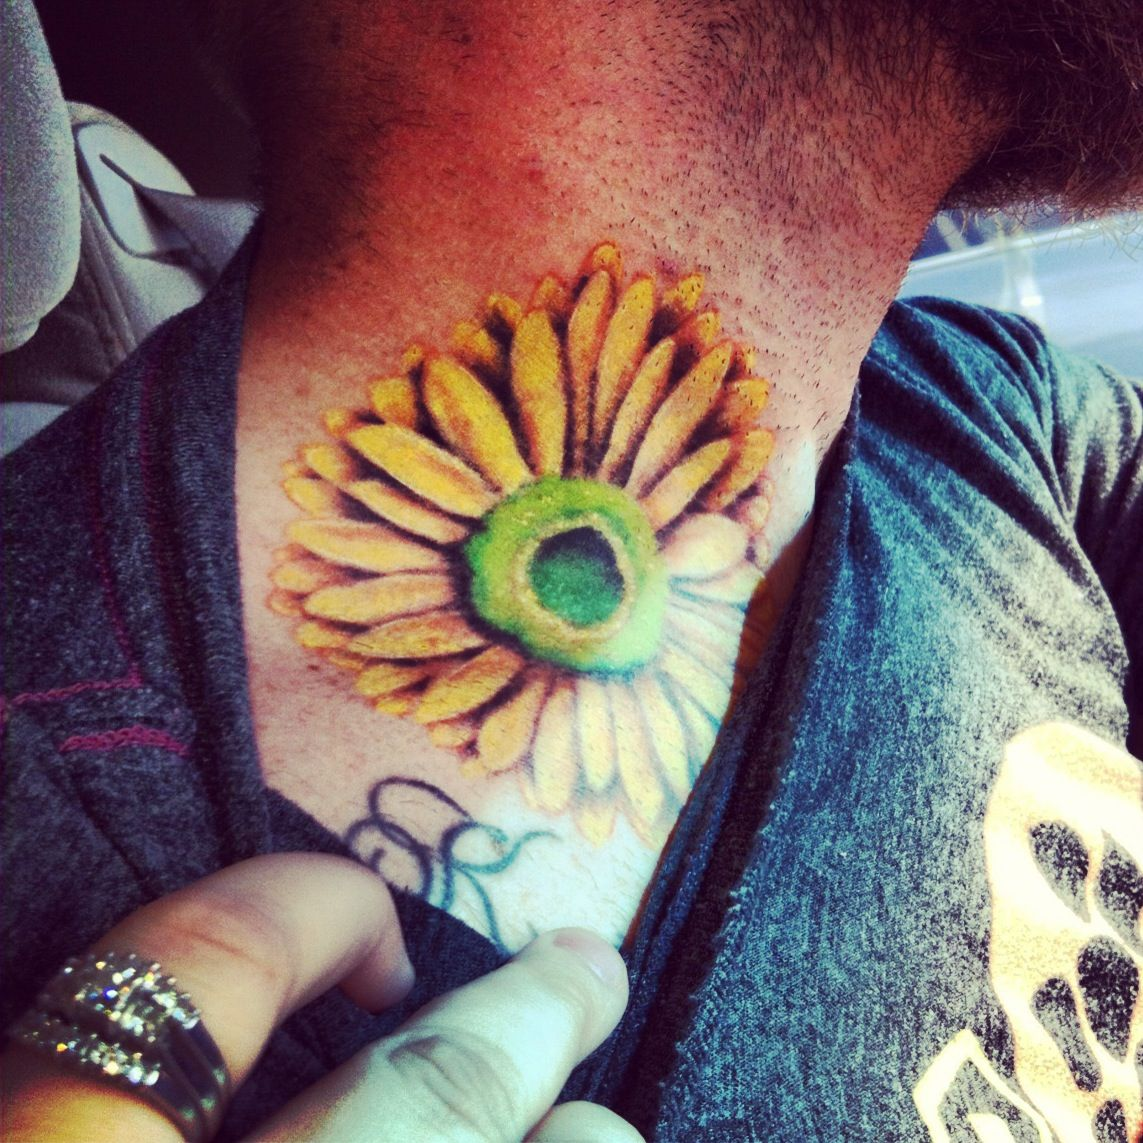 Name tattoo ideas hubby got my favorite flower tattooed next to my name    tattoo